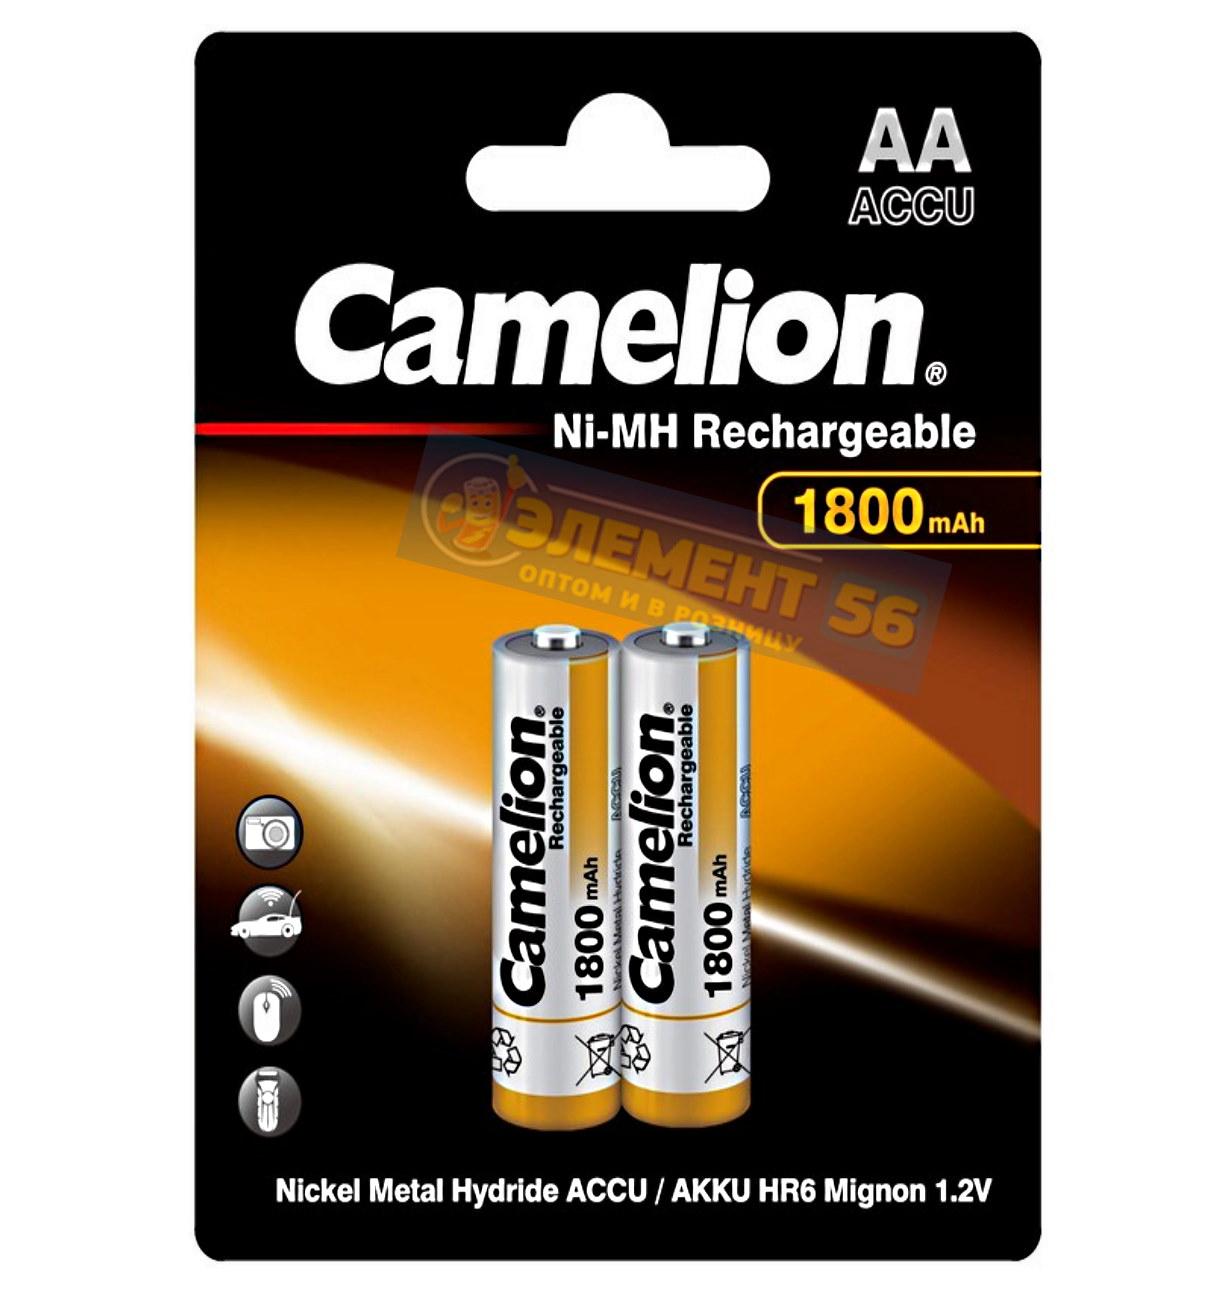 Аккумулятор CAMELION AA, HR6 (1800 mAh) MN1500, А316 2BL (2) (24) (384)